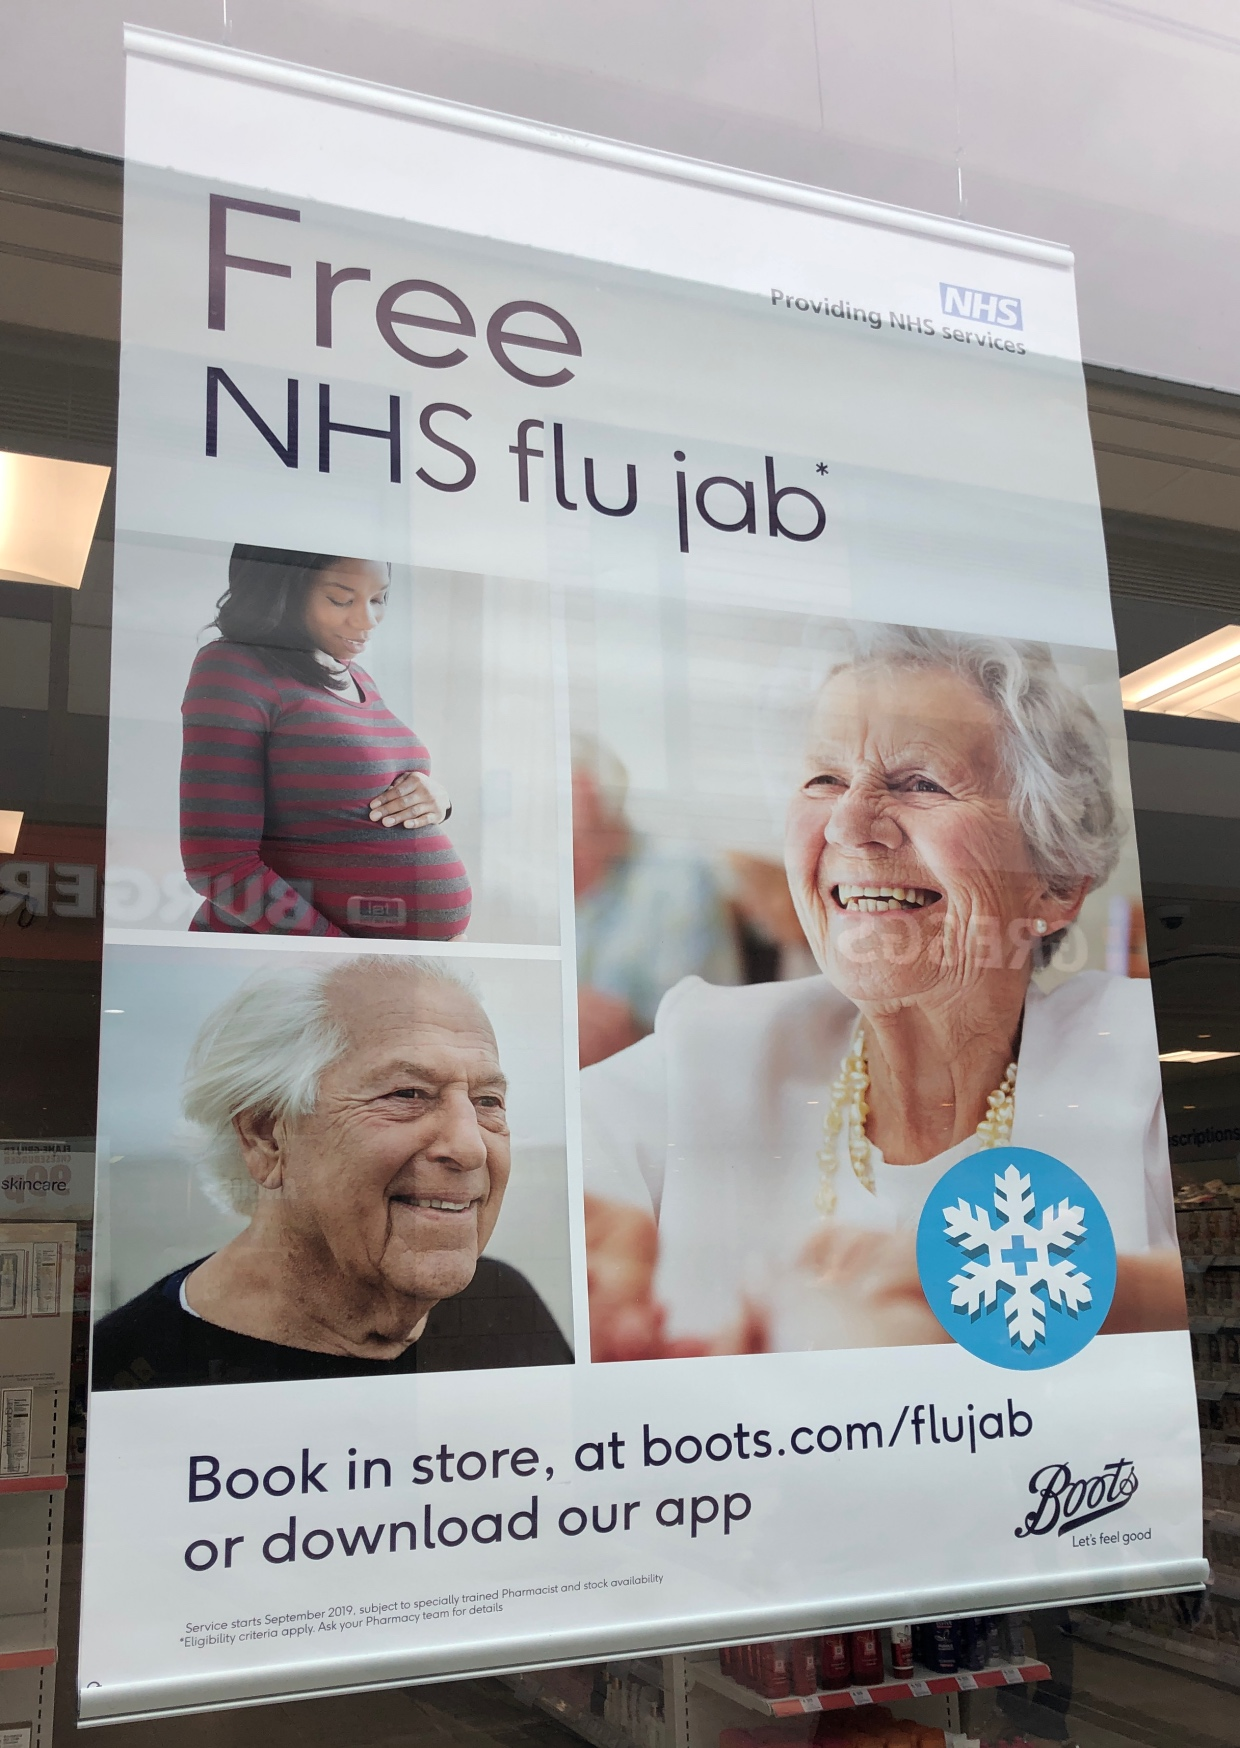 Free NHS flu jab at Boots